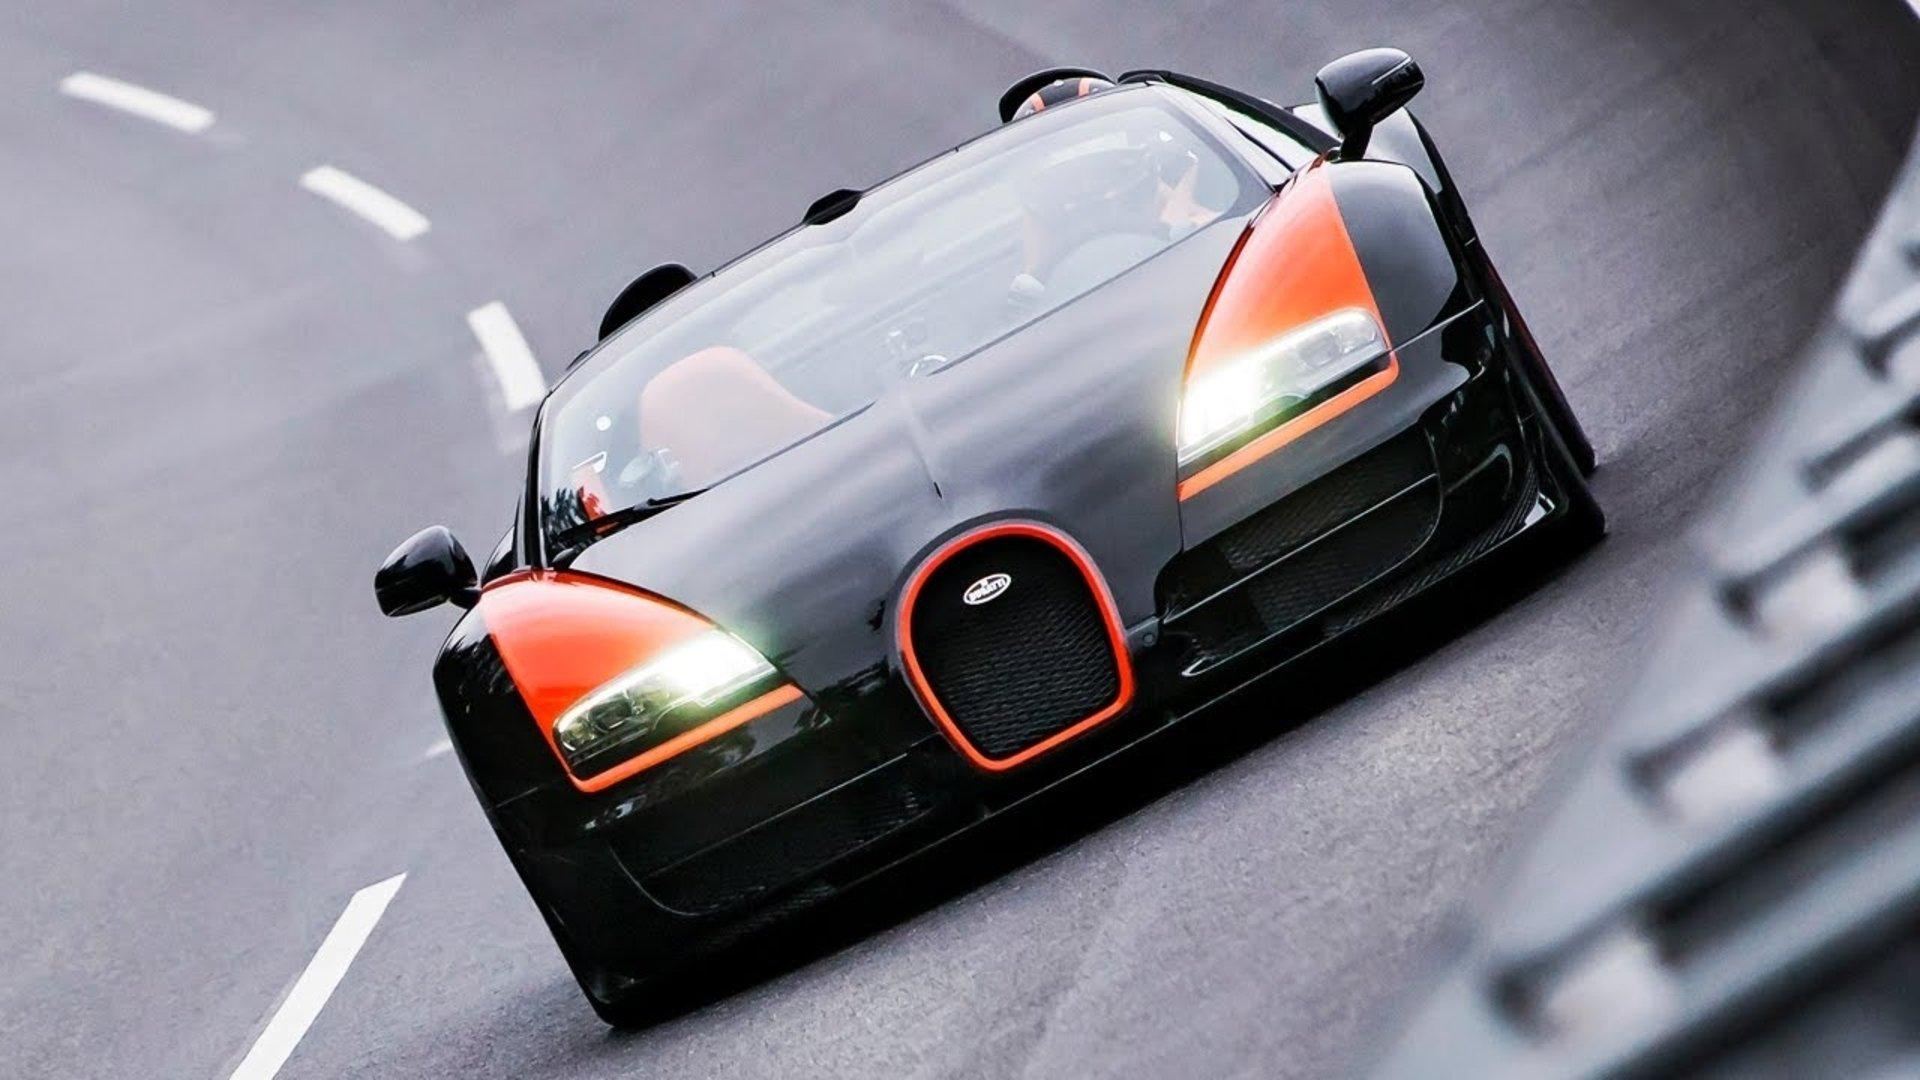 Wide Open Throttle: 6, Episode 67 - Bugatti Grand Sport Vitesse Top Speed! Plus GT-R vs R8 and ...